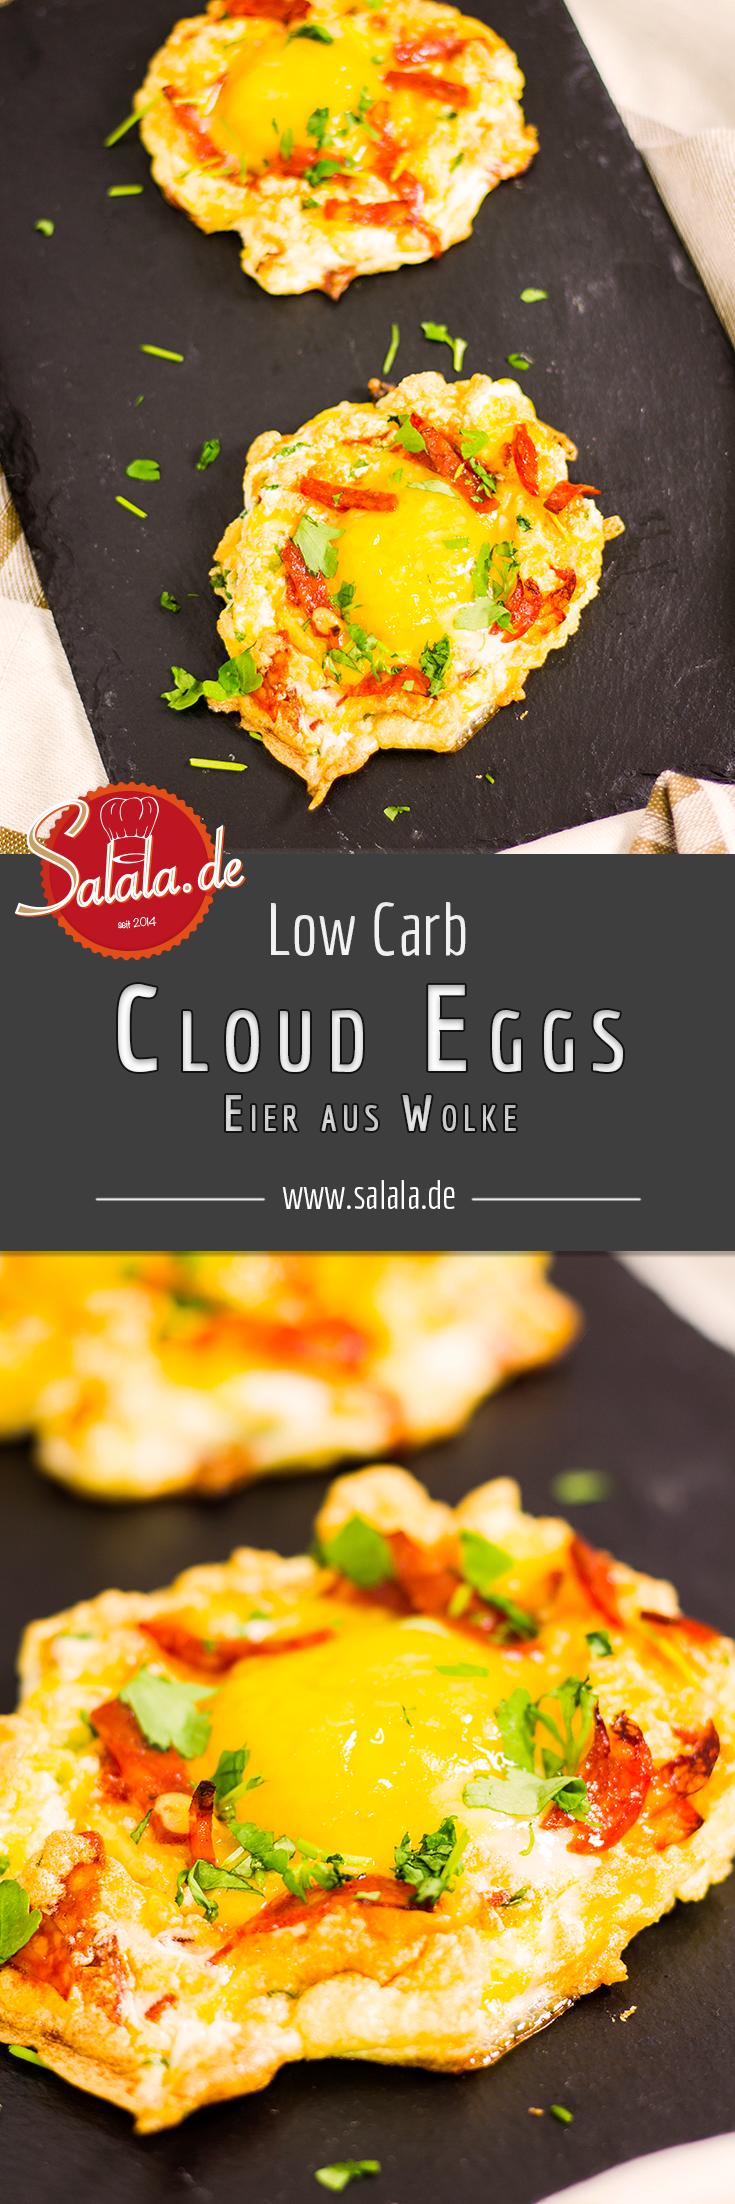 Cloud Eggs – Low Carb Frühstück | salala.de – Low Carb leicht gemacht #cloudeggs